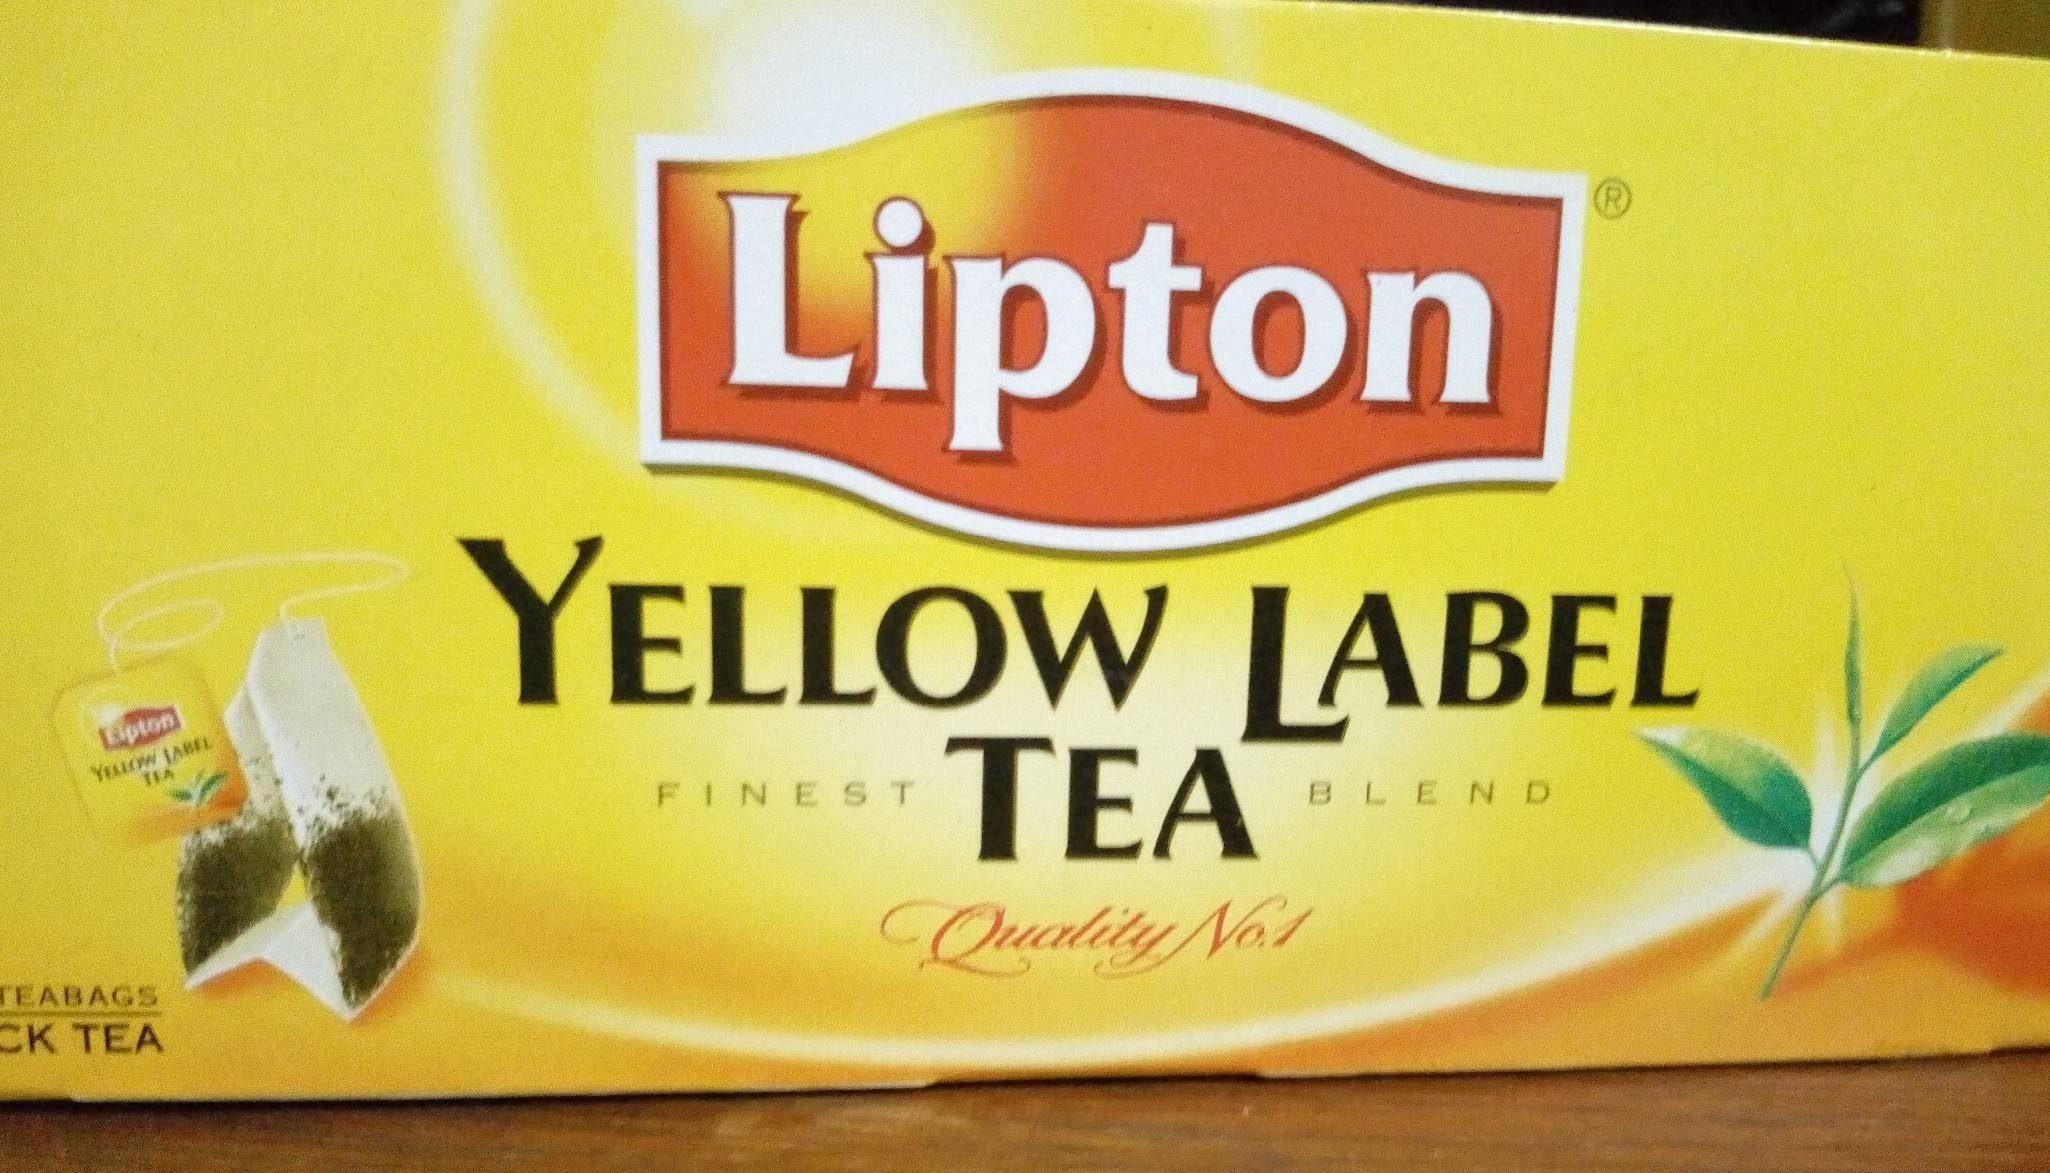 Lipton Yellow Label Tea - Produit - fr